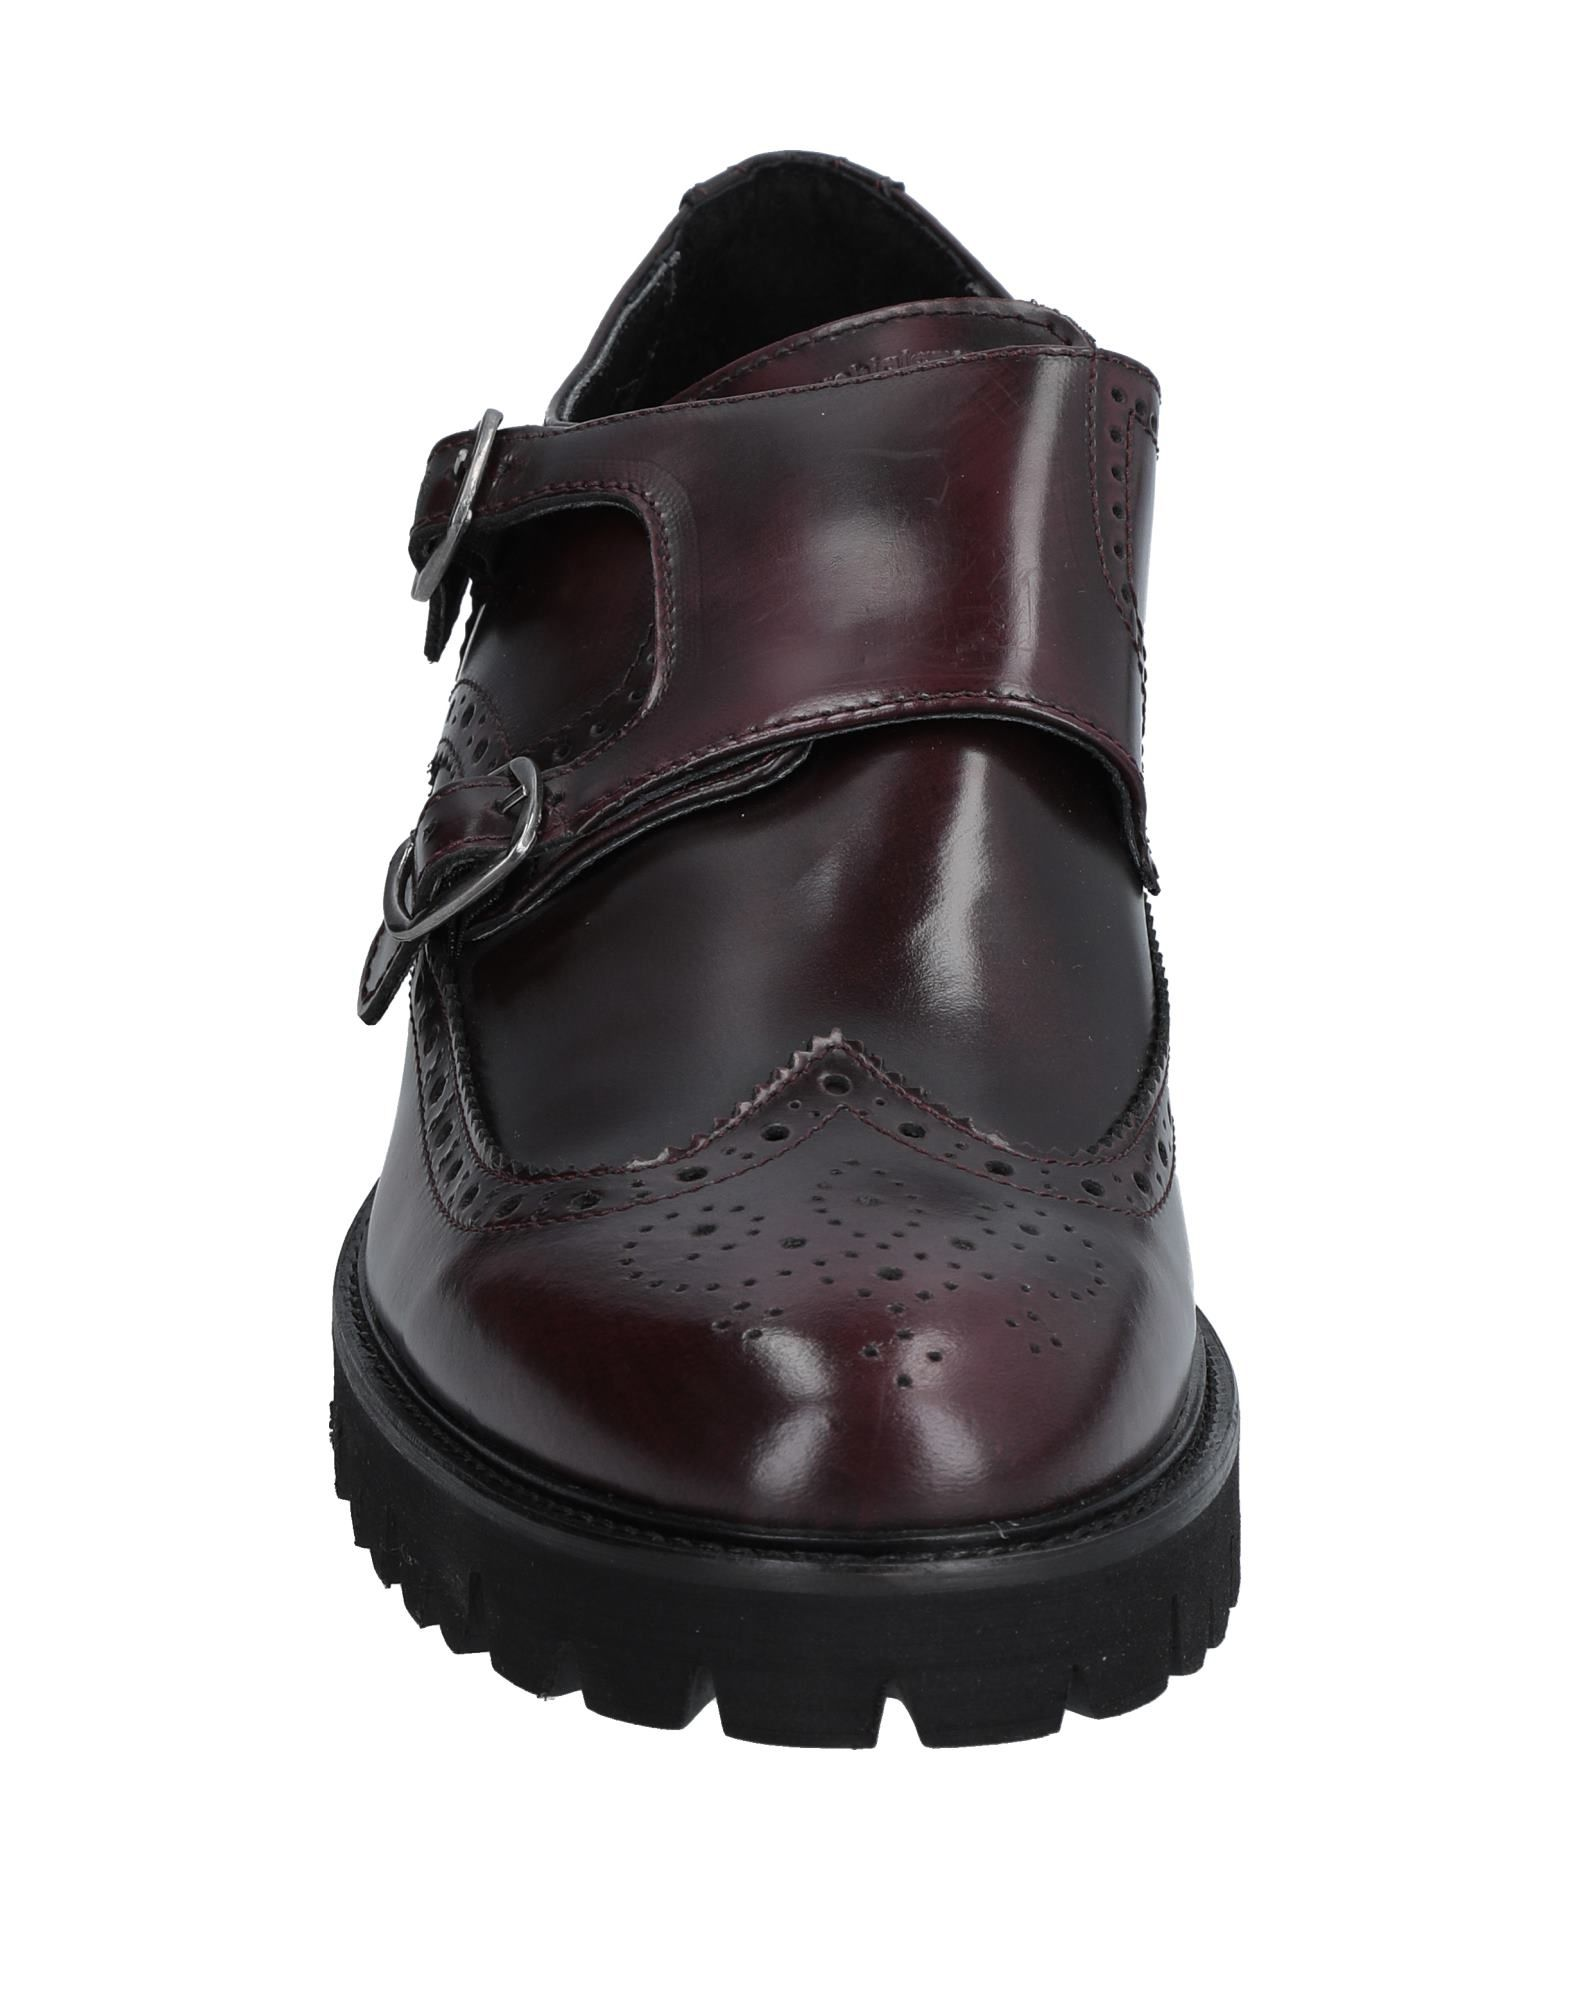 Bottega Marchigiana Mokassins Herren  11544025GX Gute Qualität beliebte Schuhe